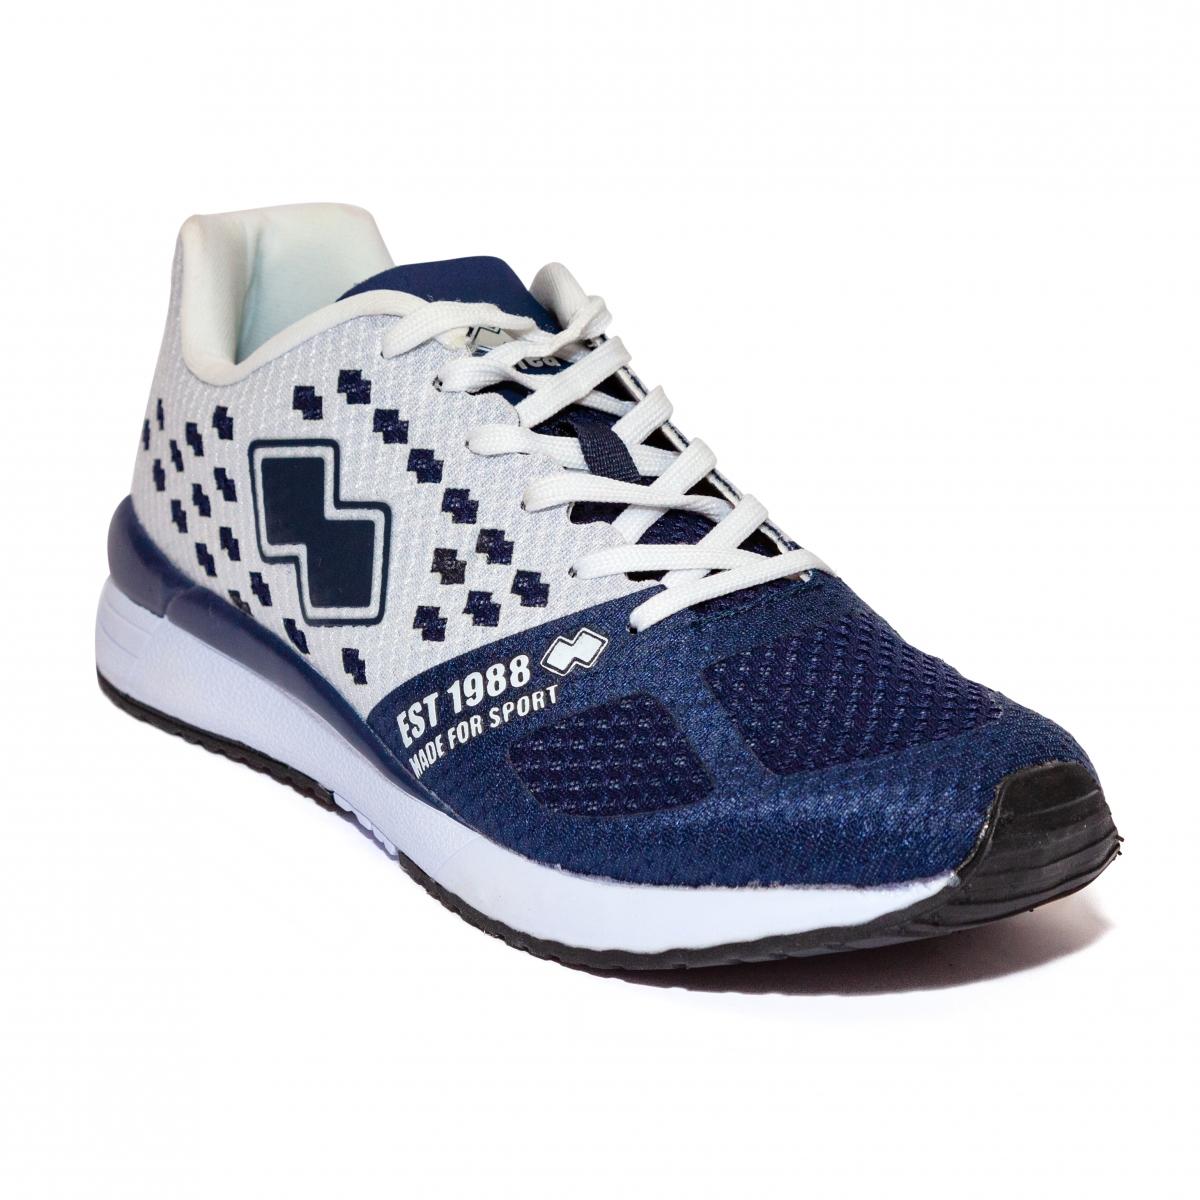 Pantofi barbati Errea laser jet scarpe alb albastru 39-47